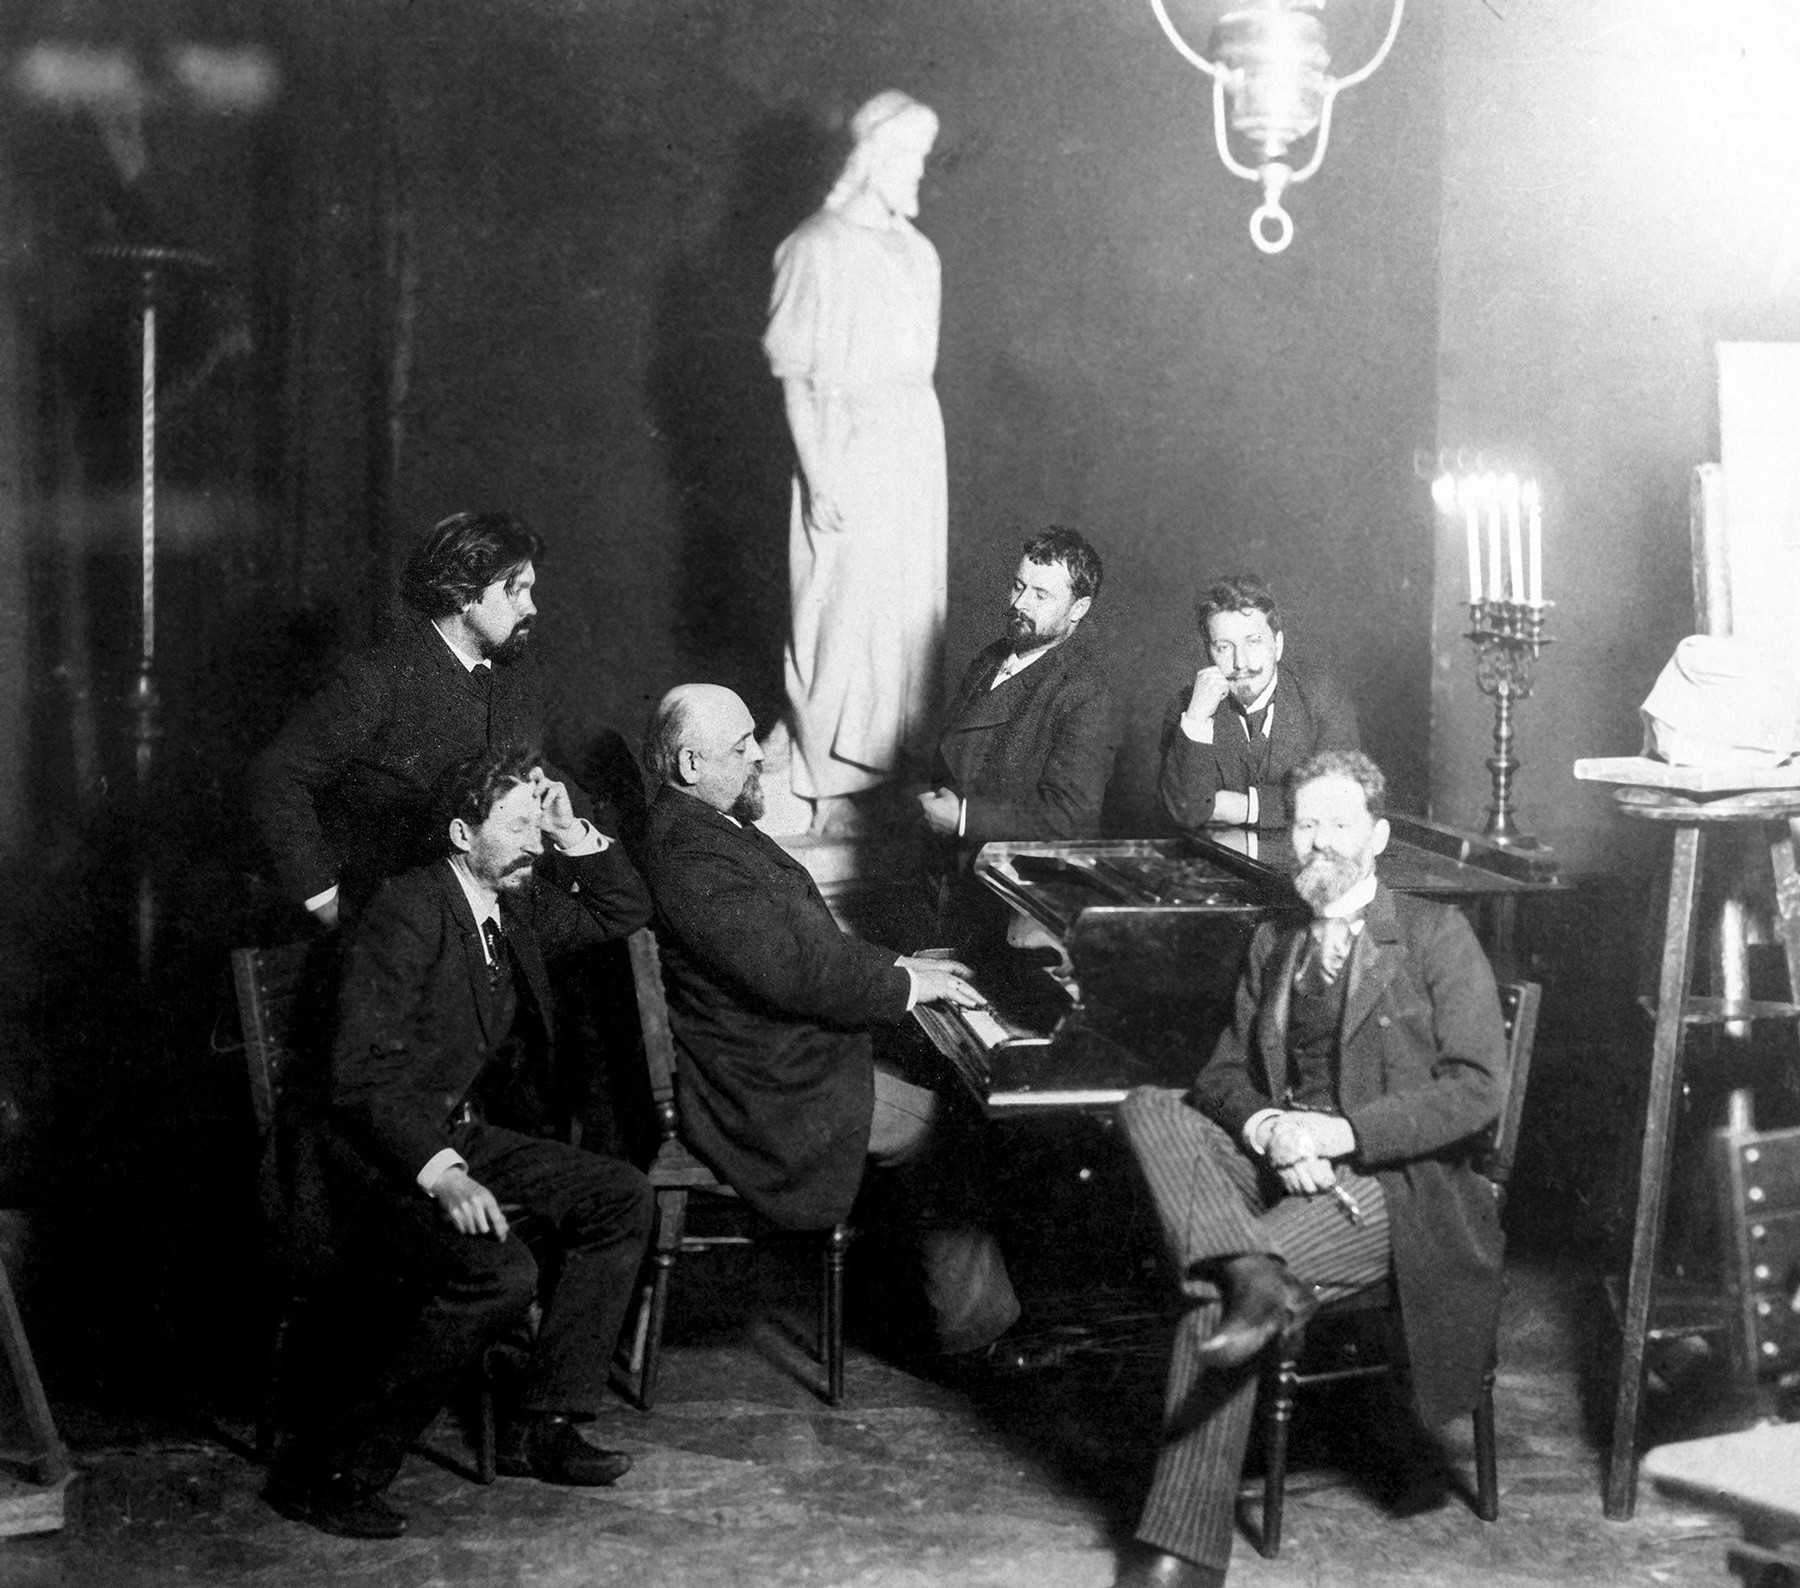 v.l.n.r.: Ilja Repin, Wassili Surikow, Konstantin Korowin, Walentin Serow und Mark Antokolskij in Abramzewo